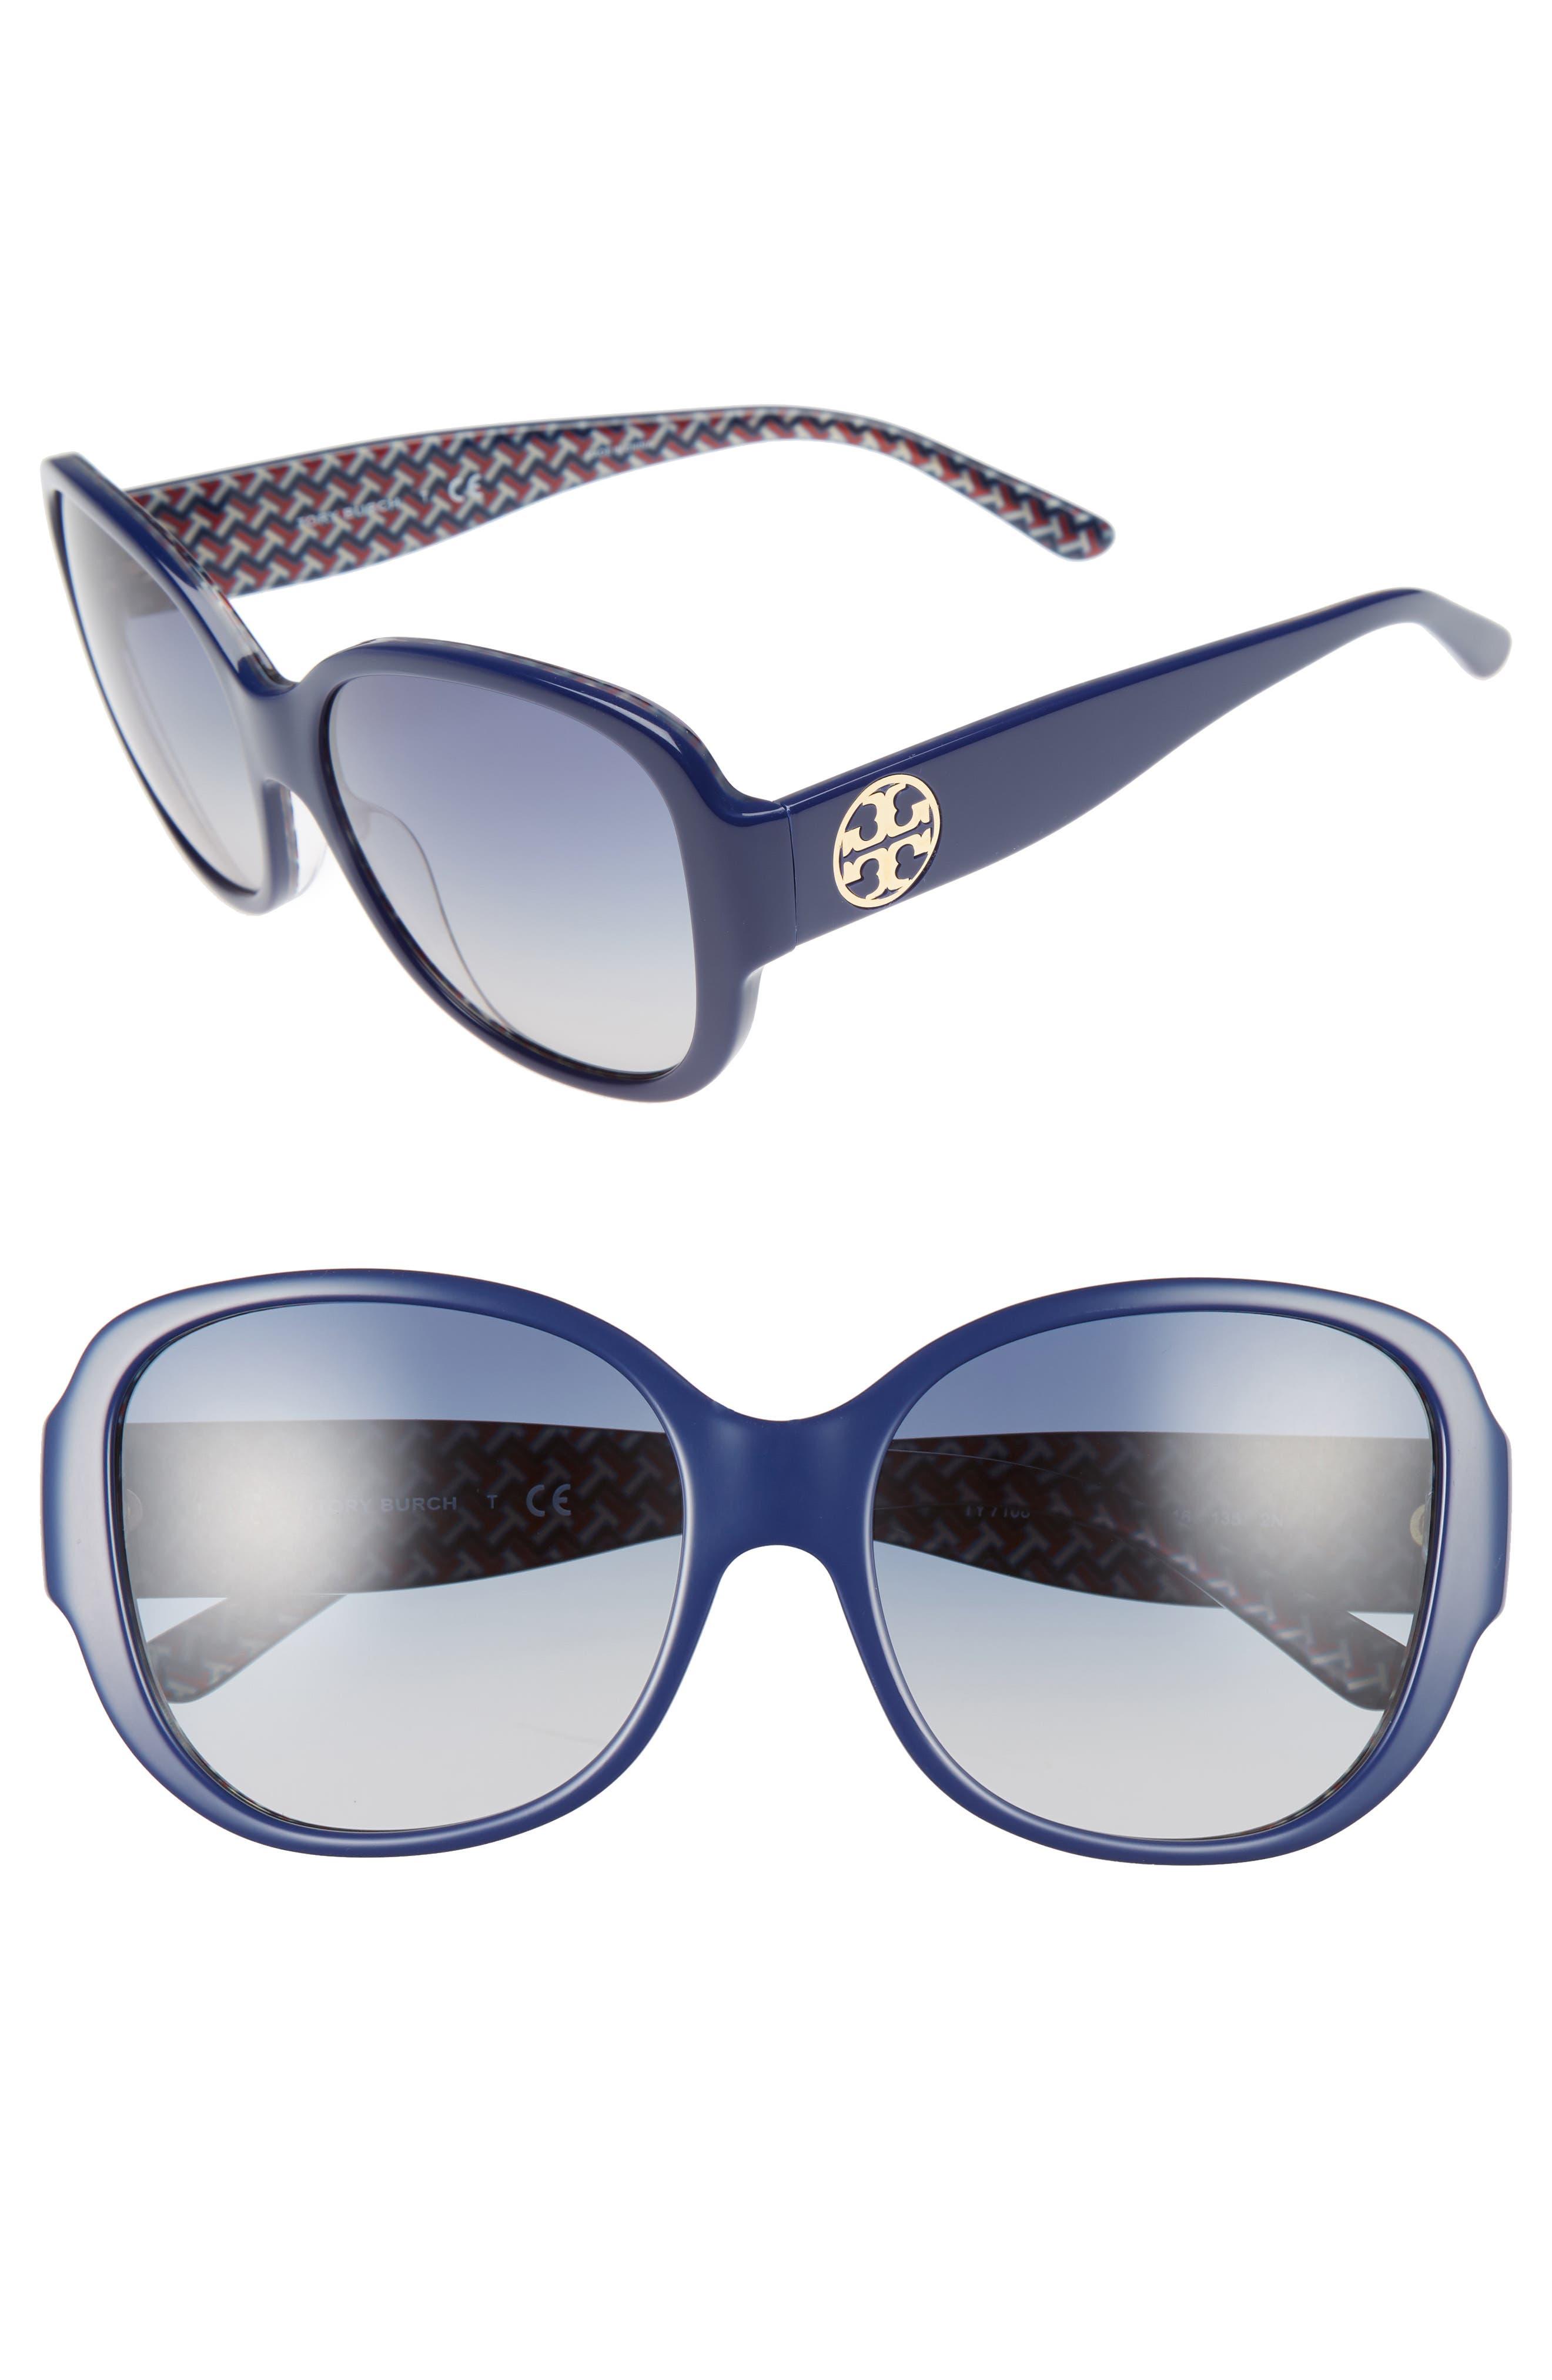 TORY BURCH 56mm Gradient Round Sunglasses